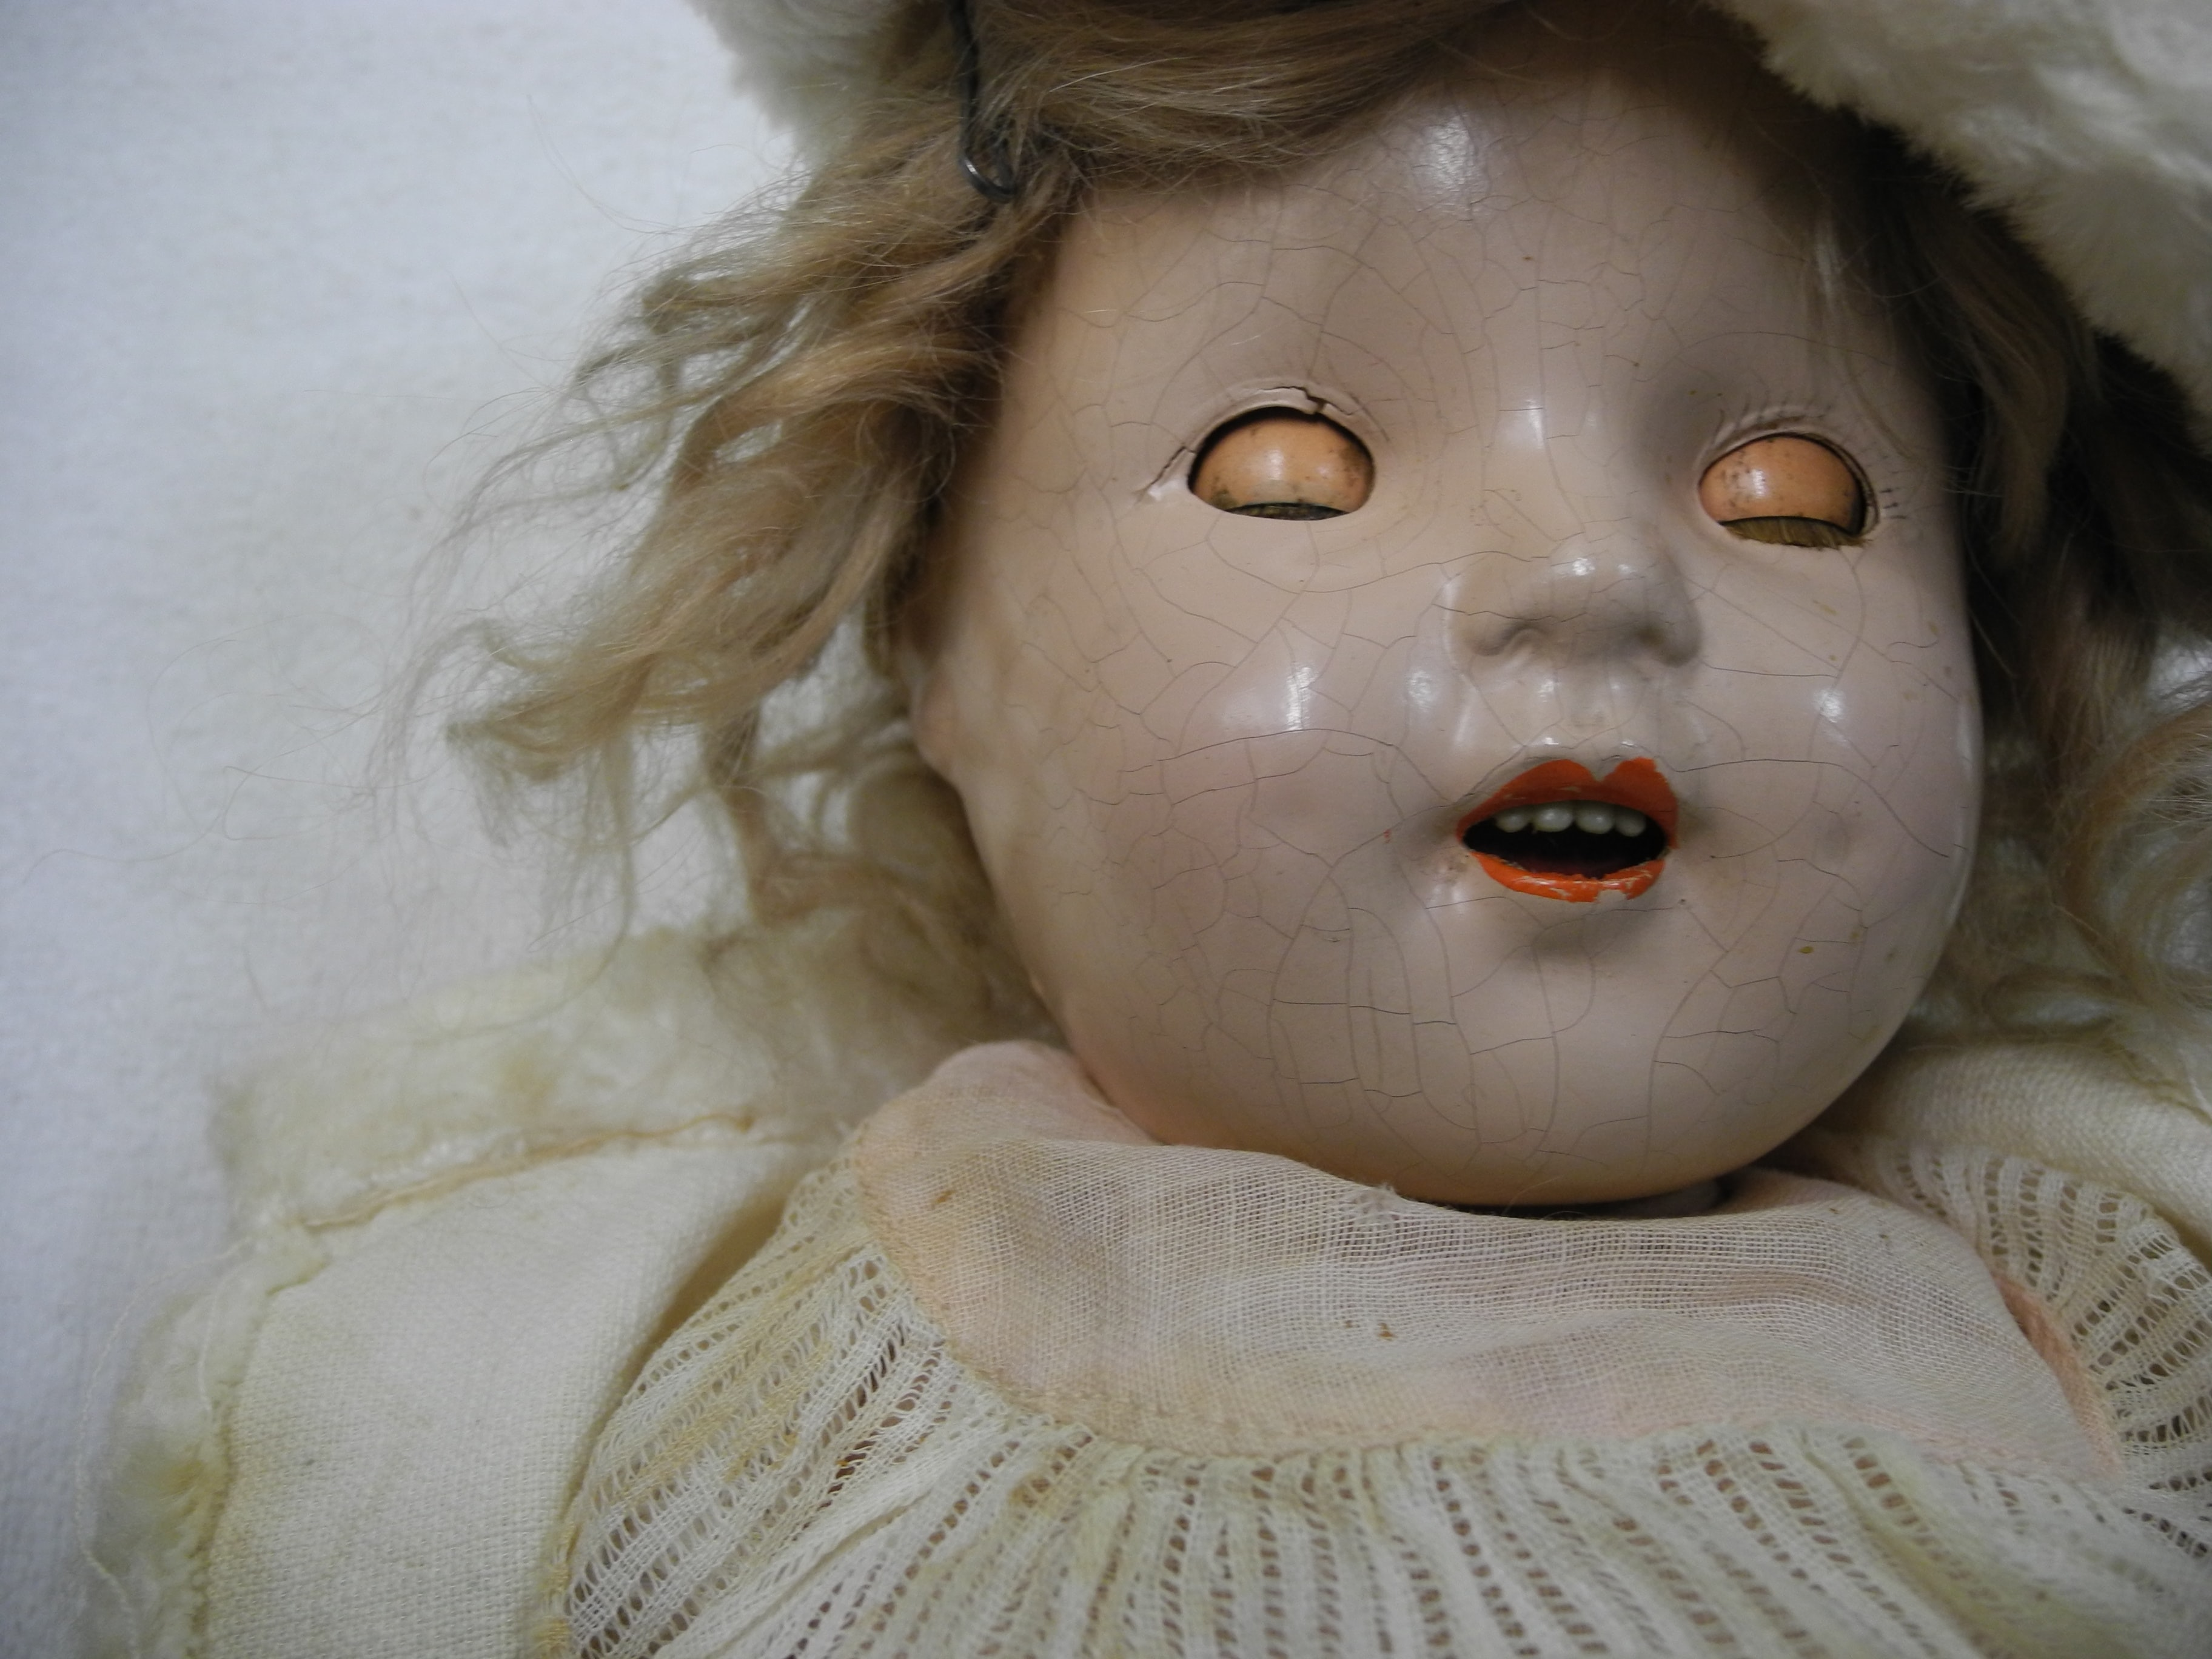 doll in white dress